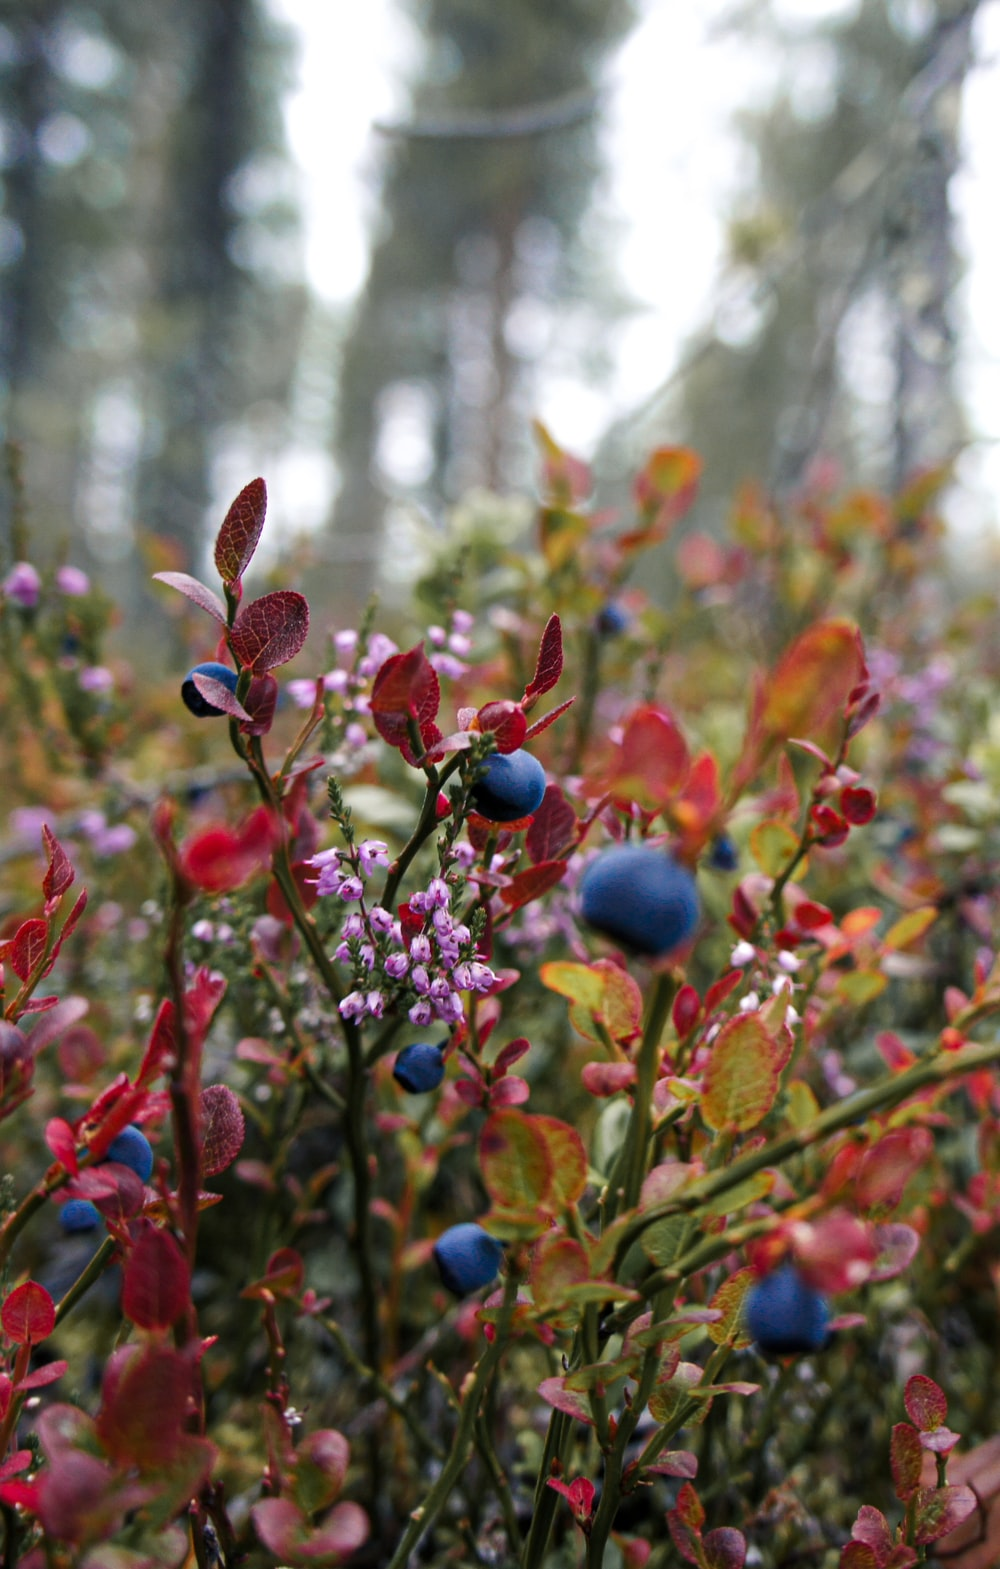 blue and red flower buds in tilt shift lens